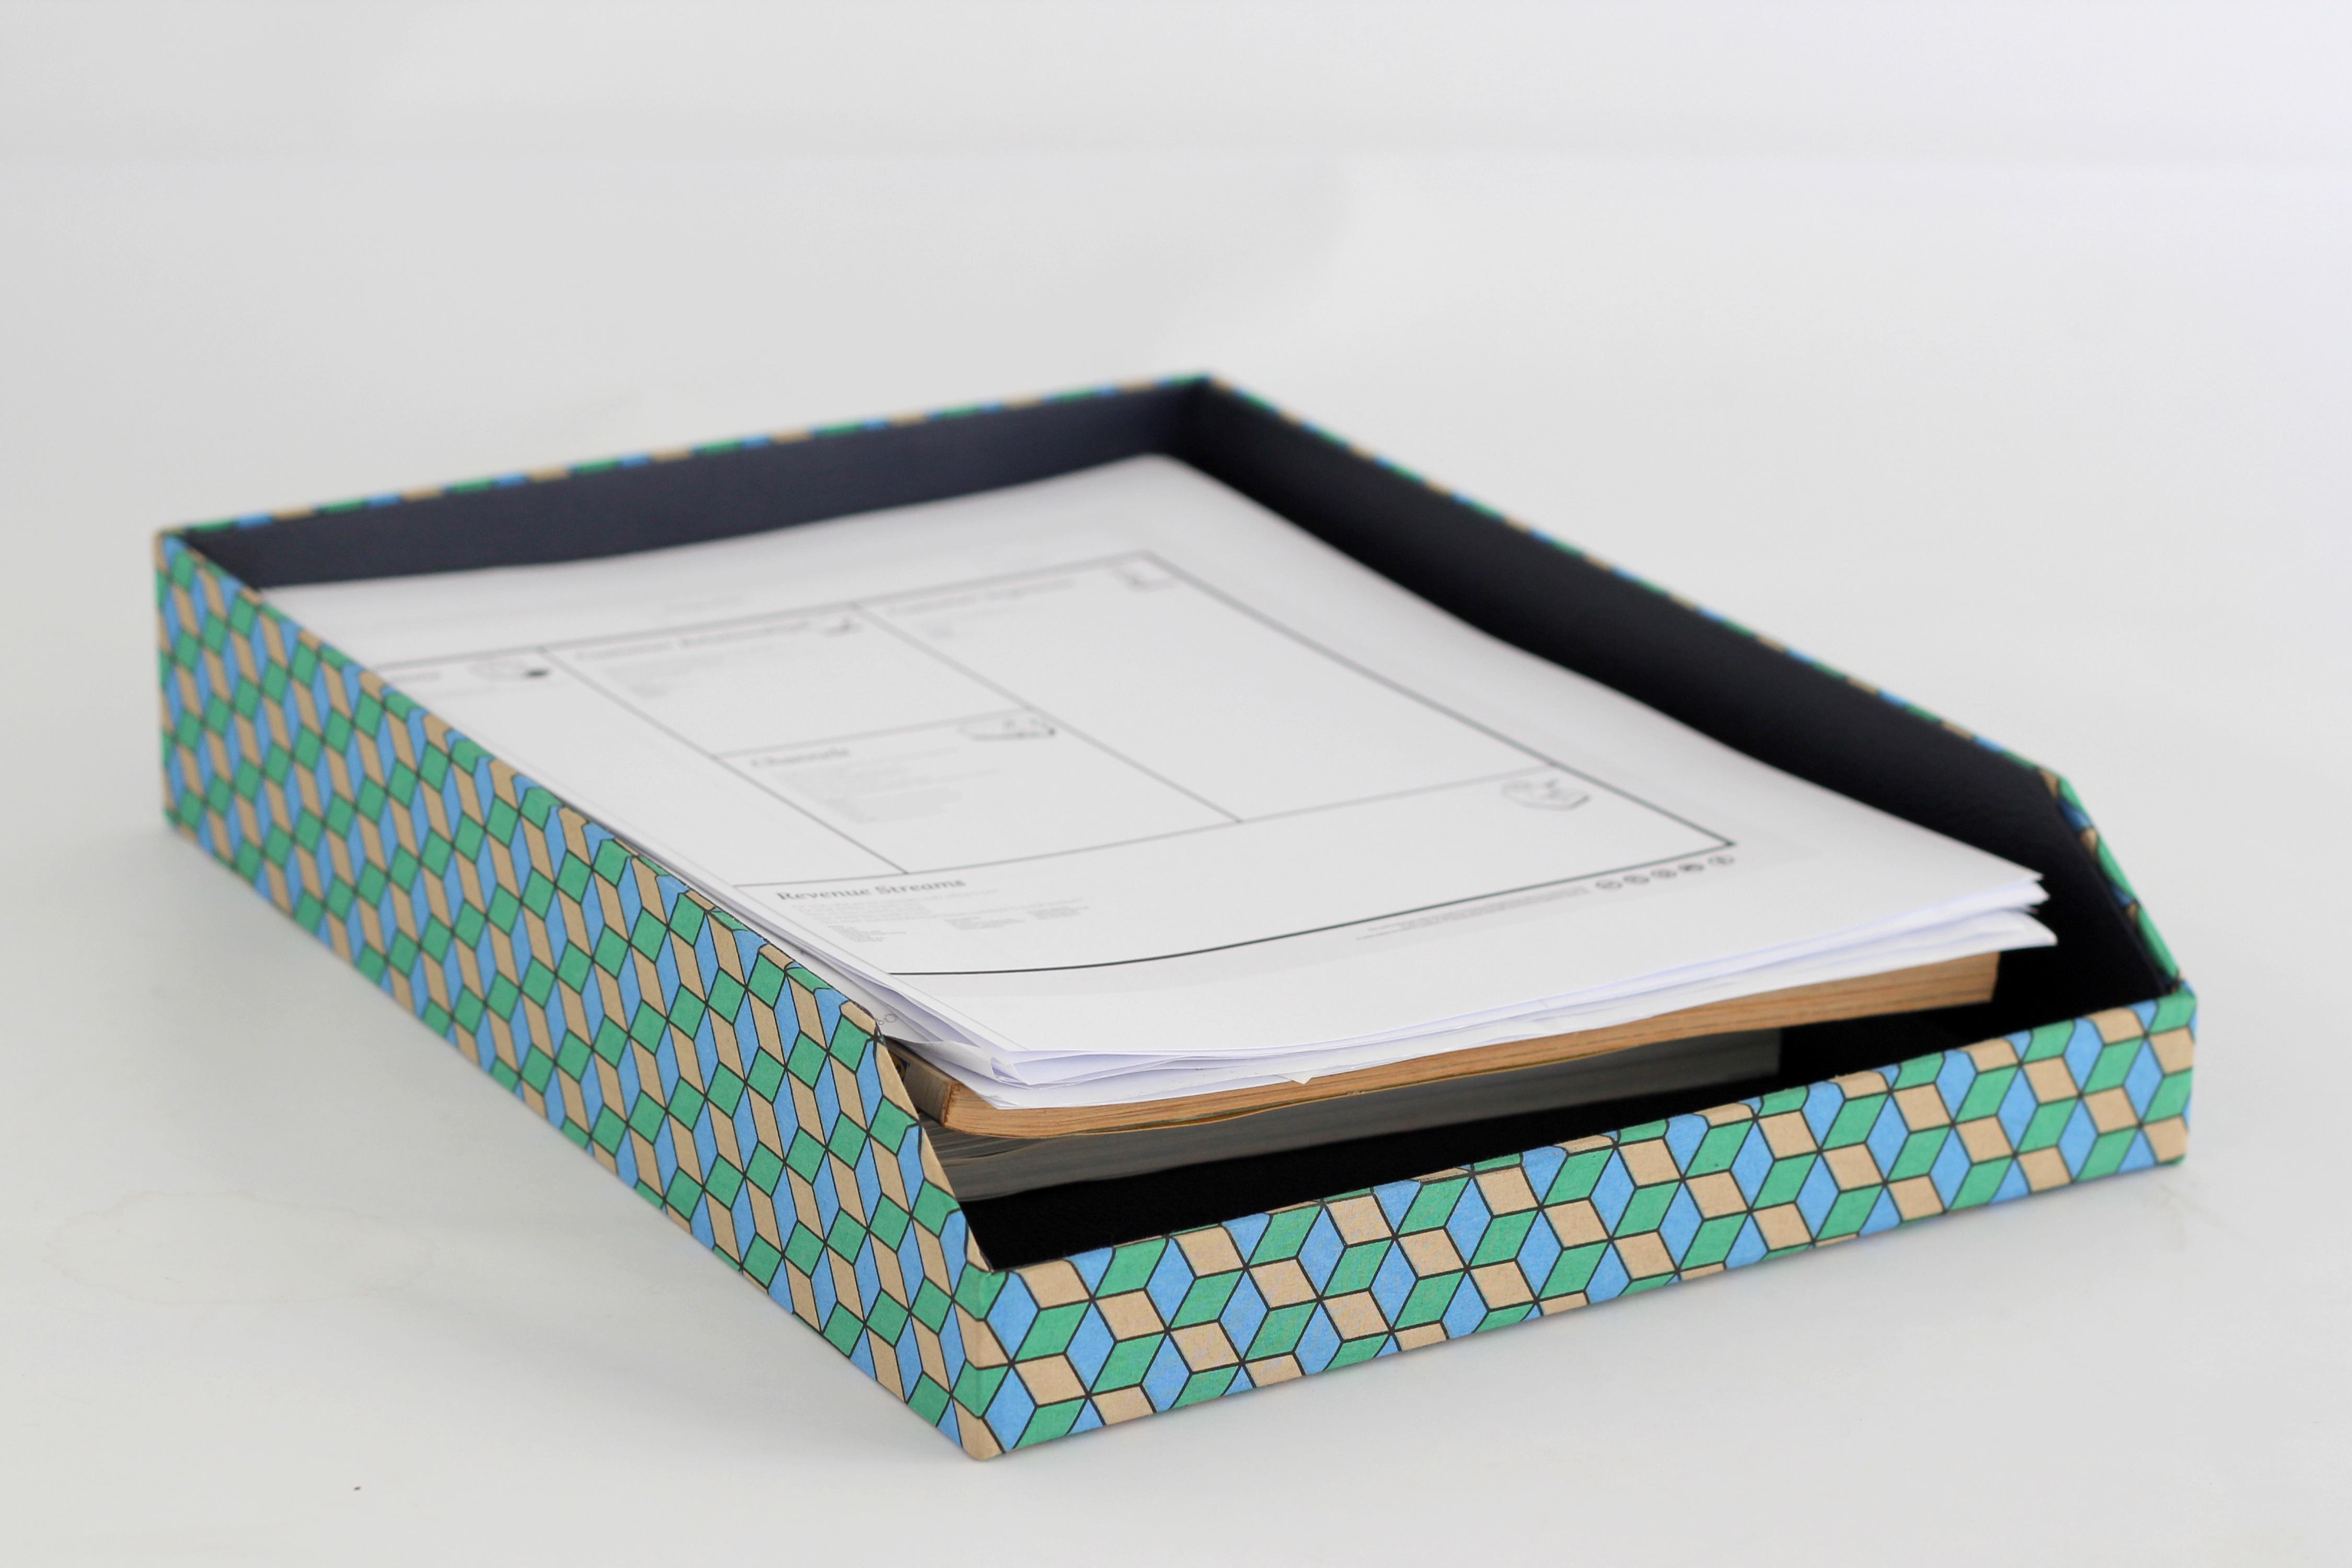 Garilanocraft u00bb Blog Archive u00bb Paper Tray